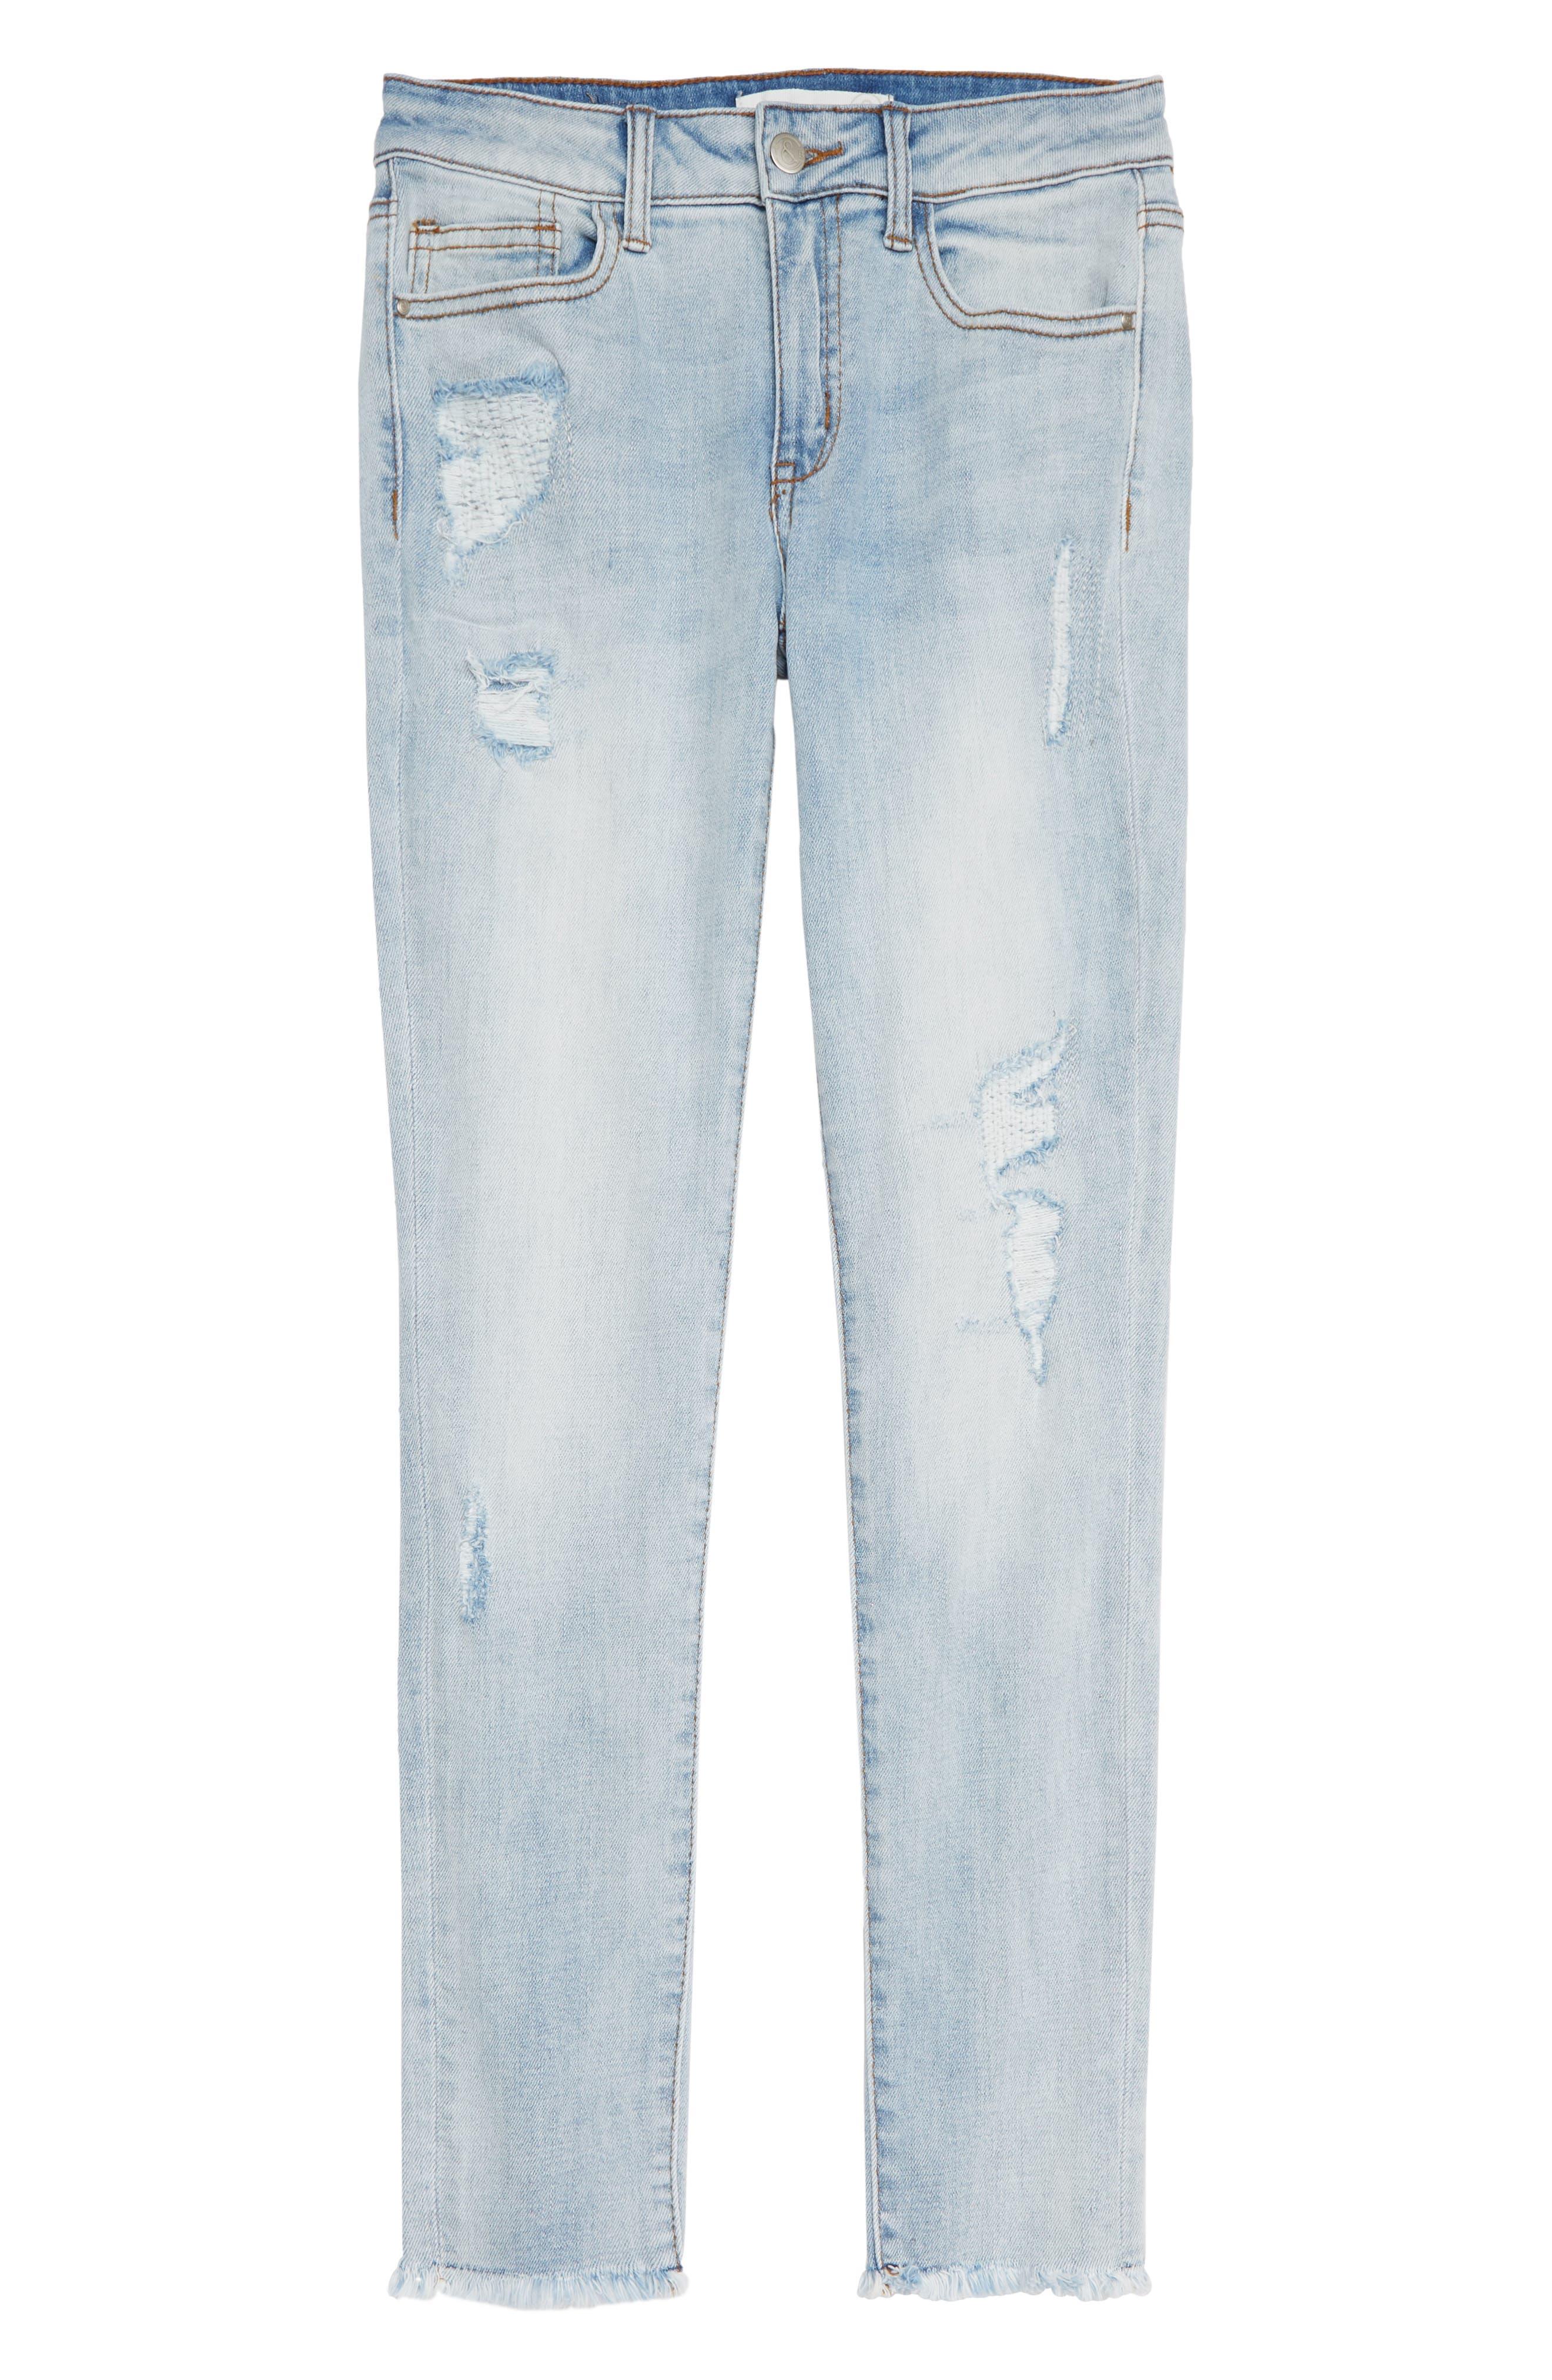 Girls Treasure  Bond Repaired Girlfriend Jeans Size 16  Blue